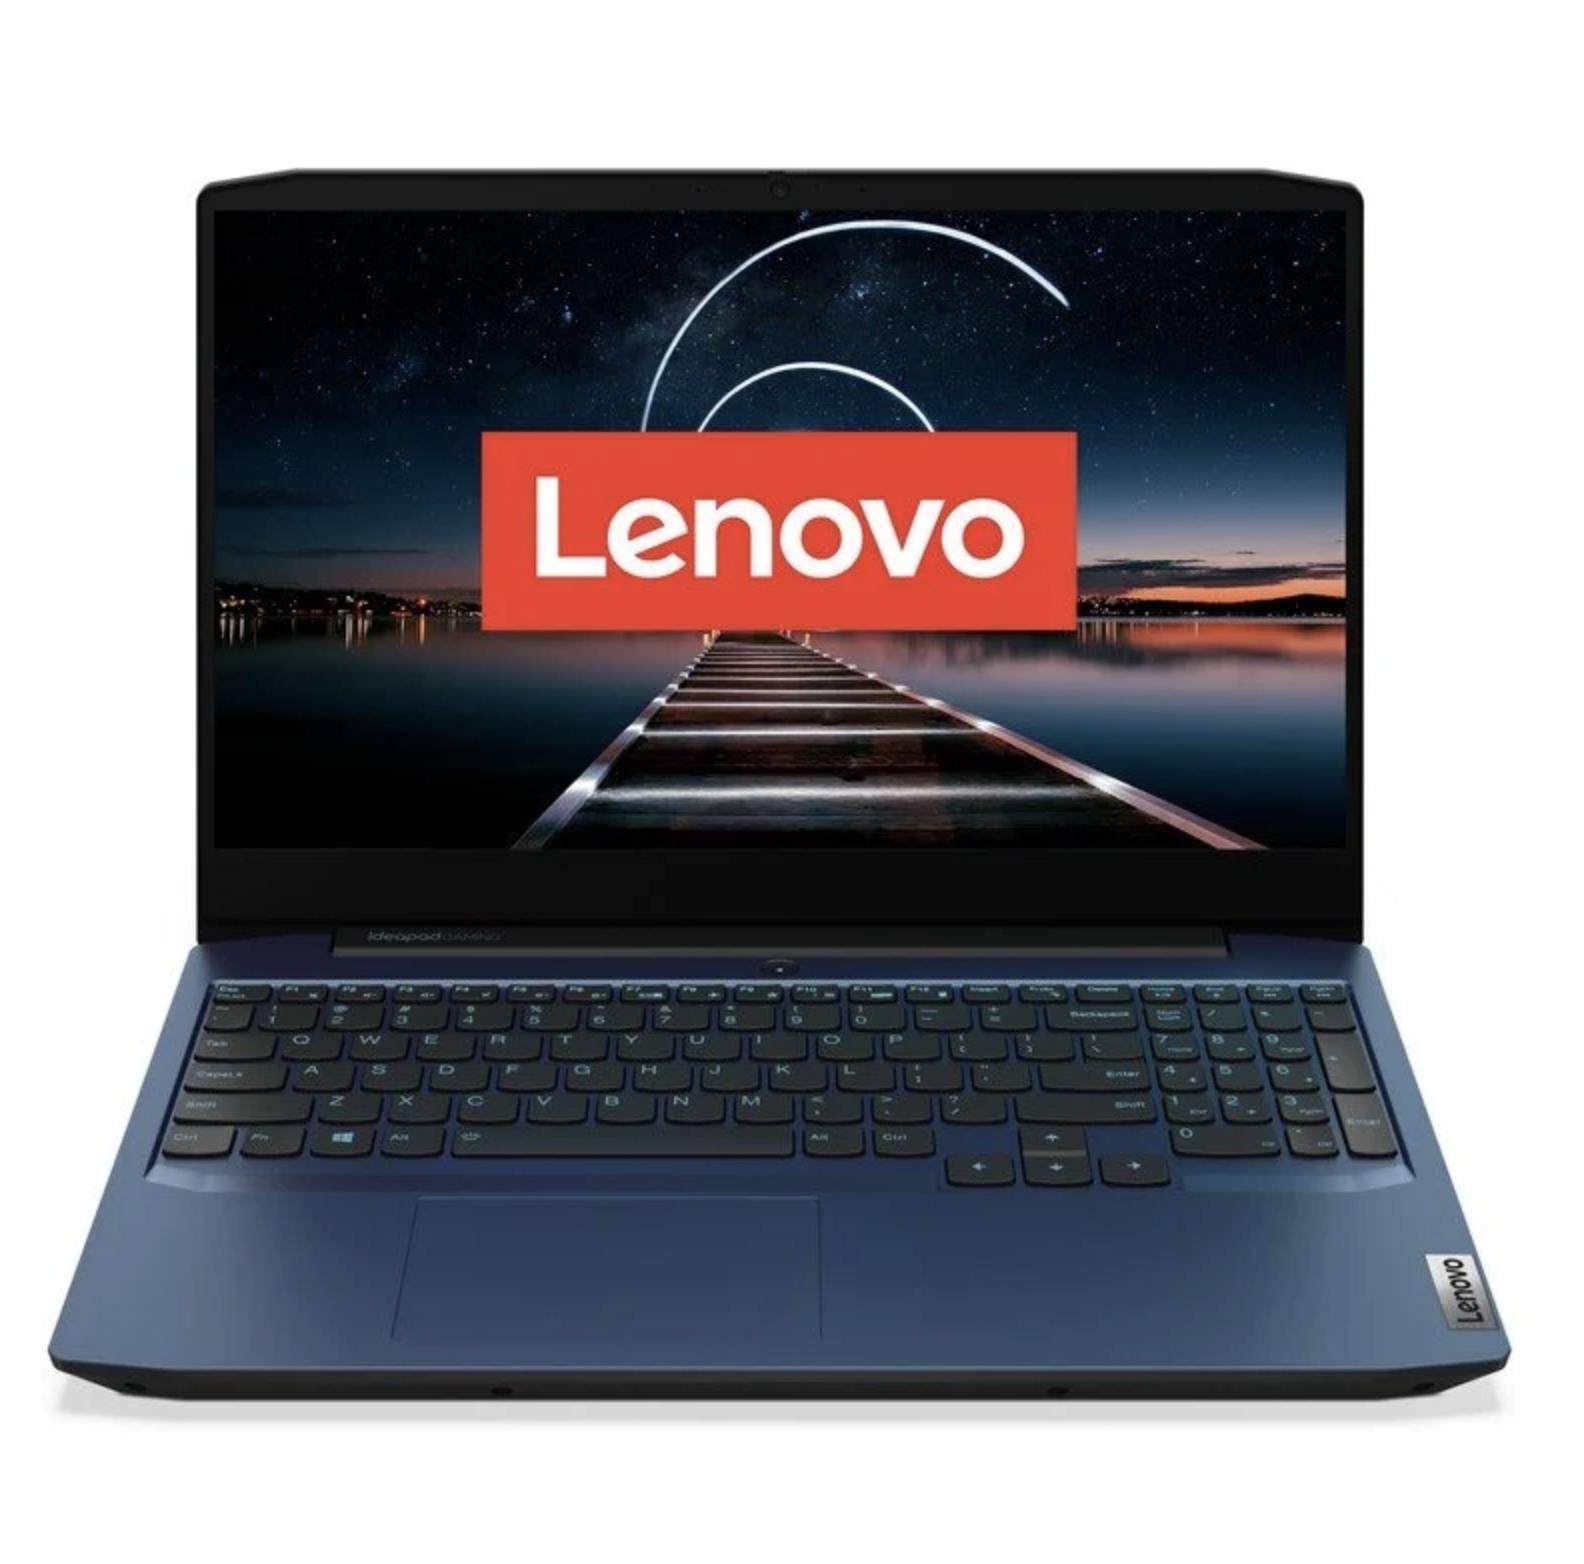 Lenovo IdeaPad Gaming 3 15ARH05 AMD Ryzen 7 4800H 16 GB 512GB SSD GTX1650 156